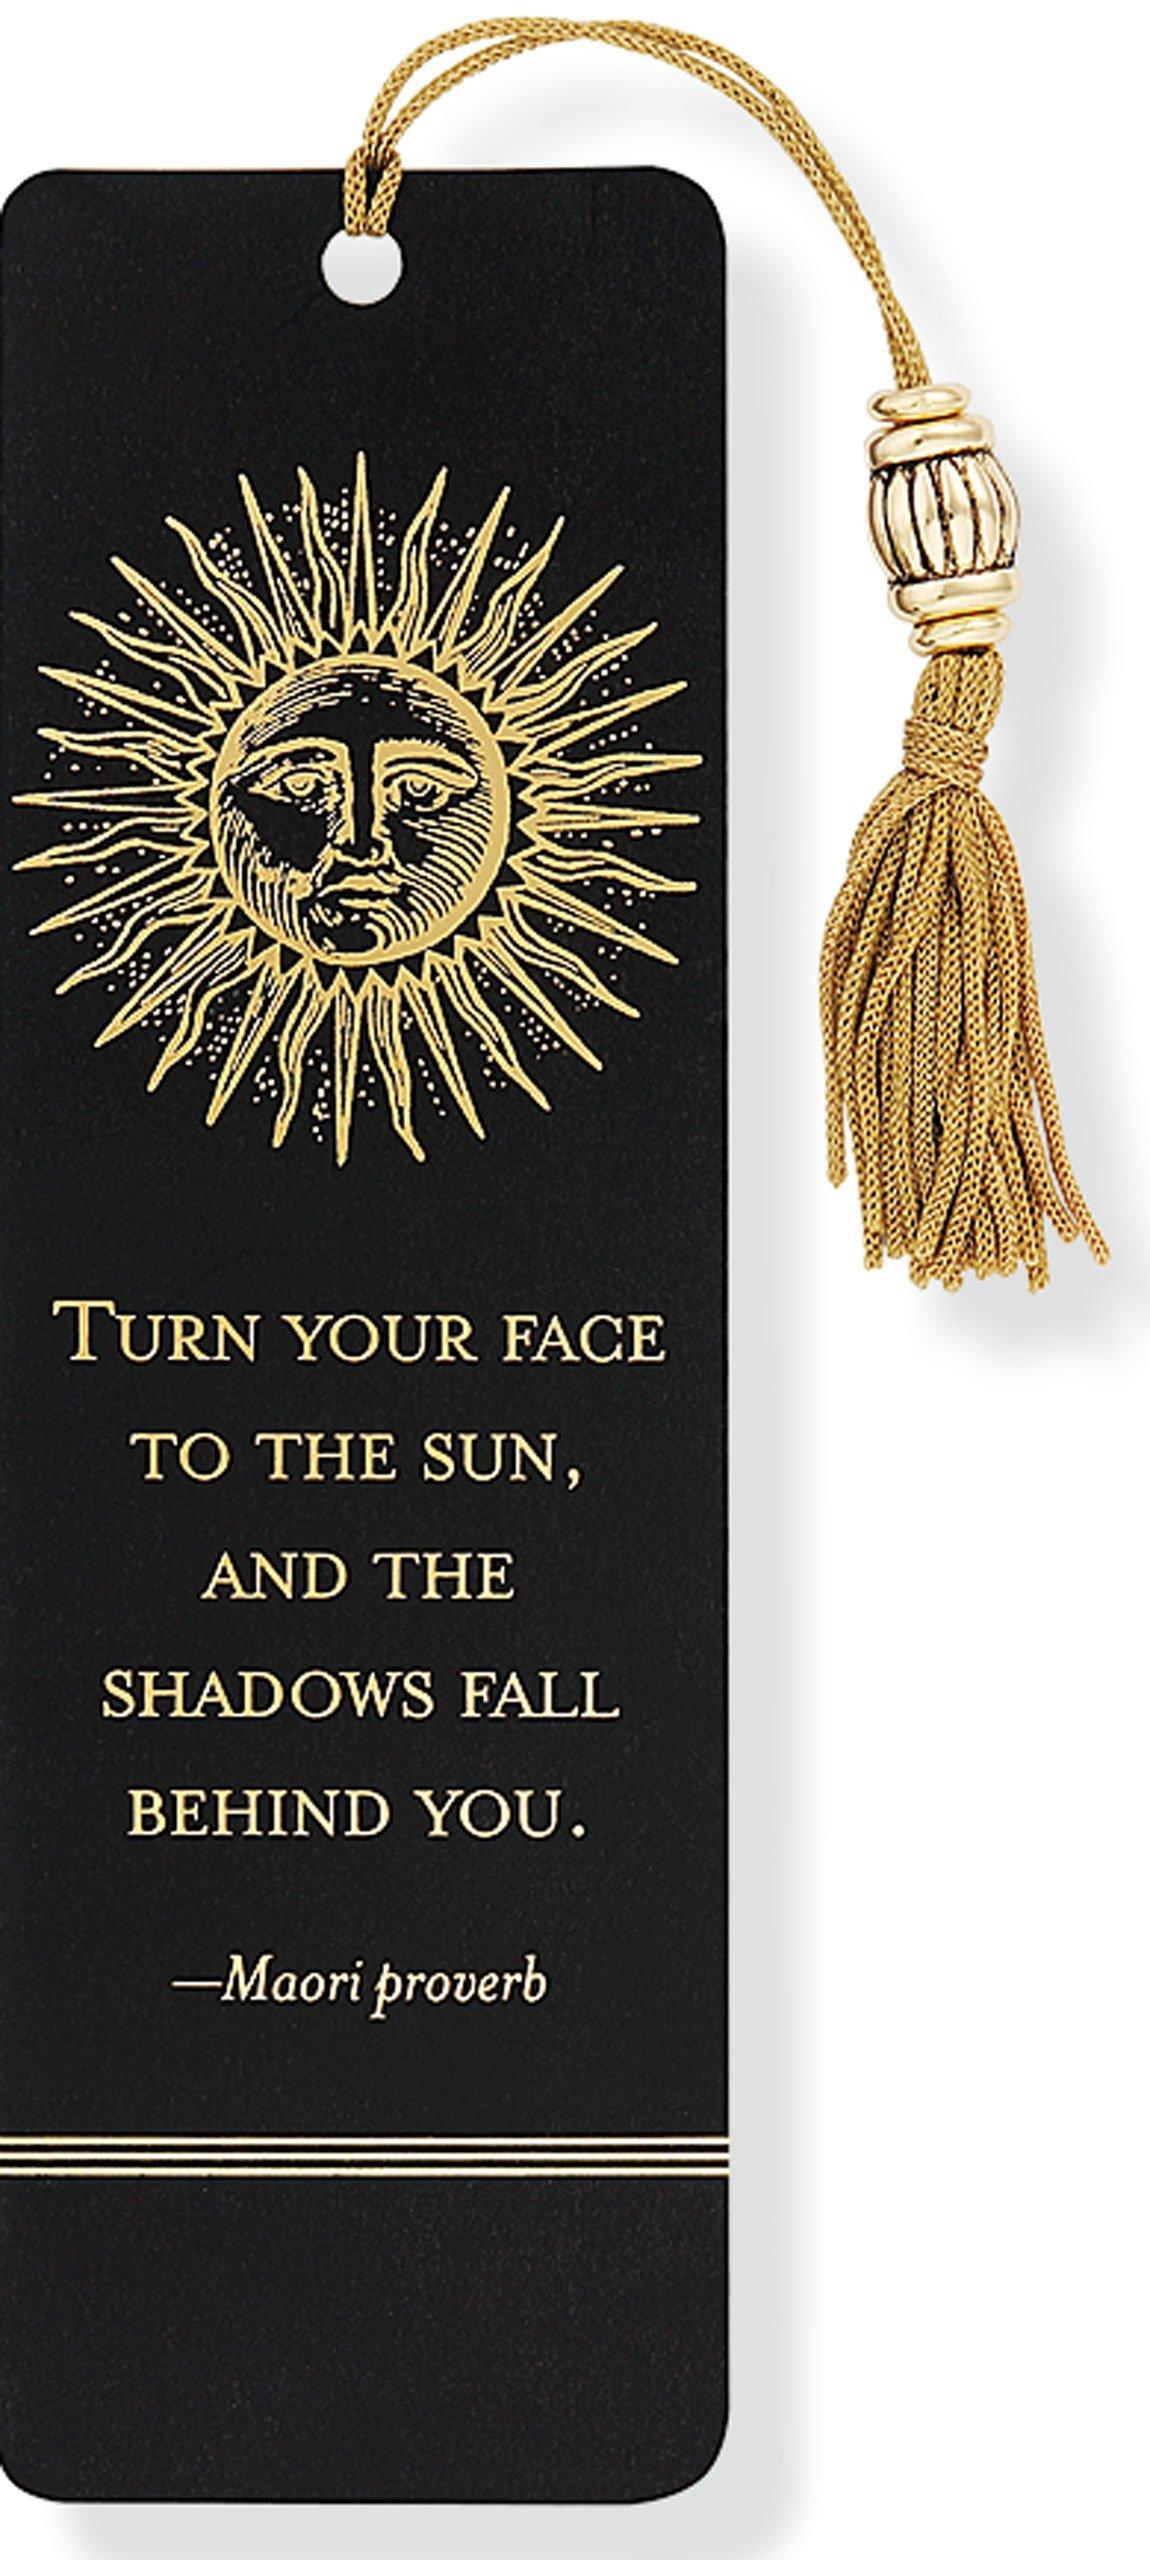 Sun Beaded Bookmark Misc. Supplies – Jan 1 2009 Peter Pauper Press 1593593279 Unclassifiable: WZ BIC Nonfiction /